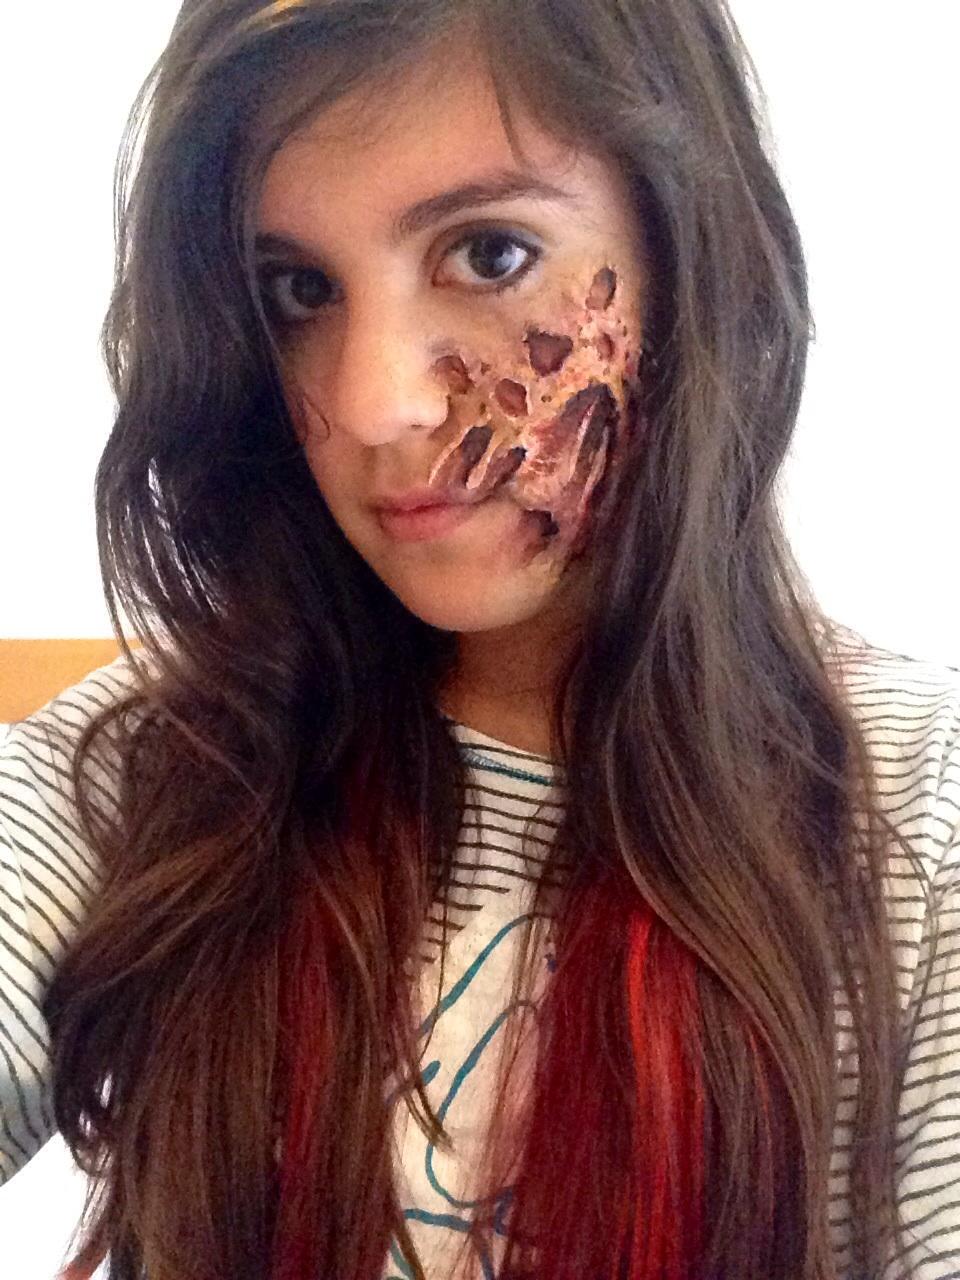 Deadpool Freddy Krueger Burnt Face By Mariana A On Deviantart